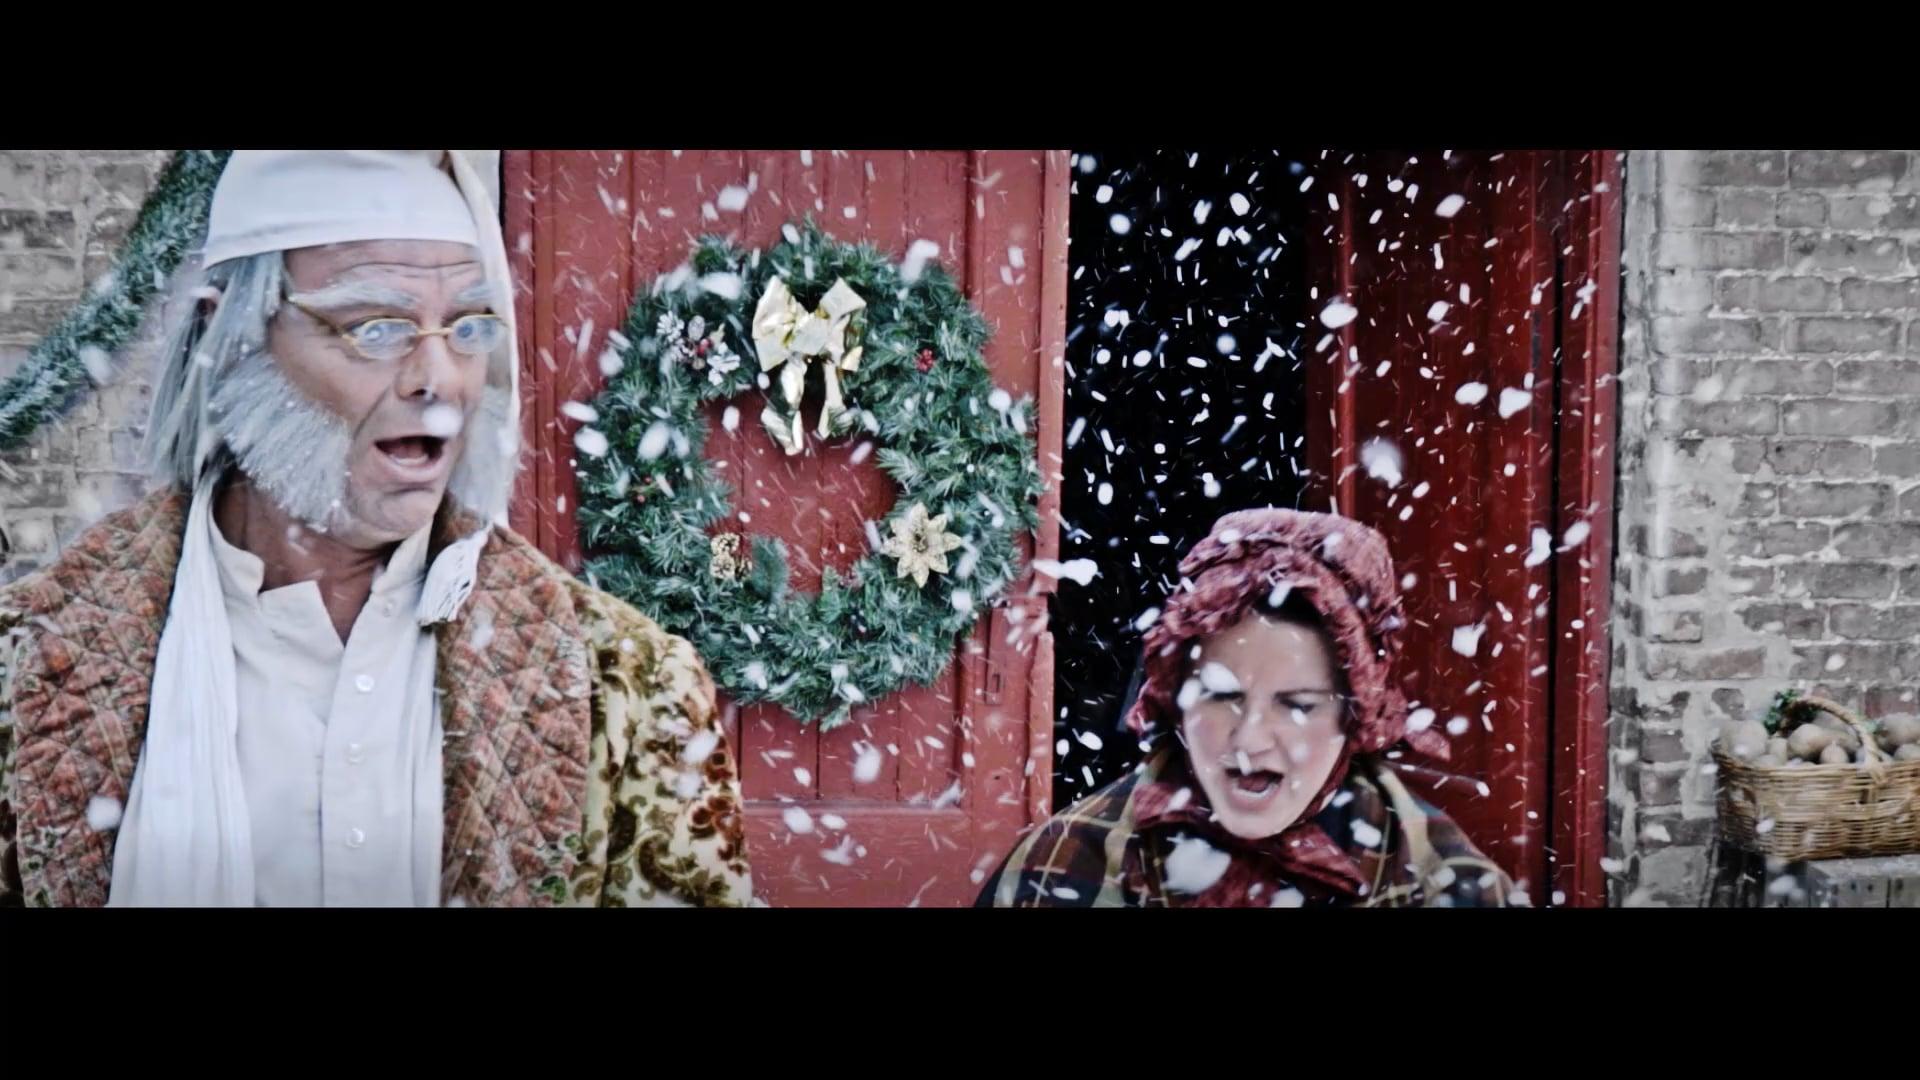 Scrooge - Mediacom Business